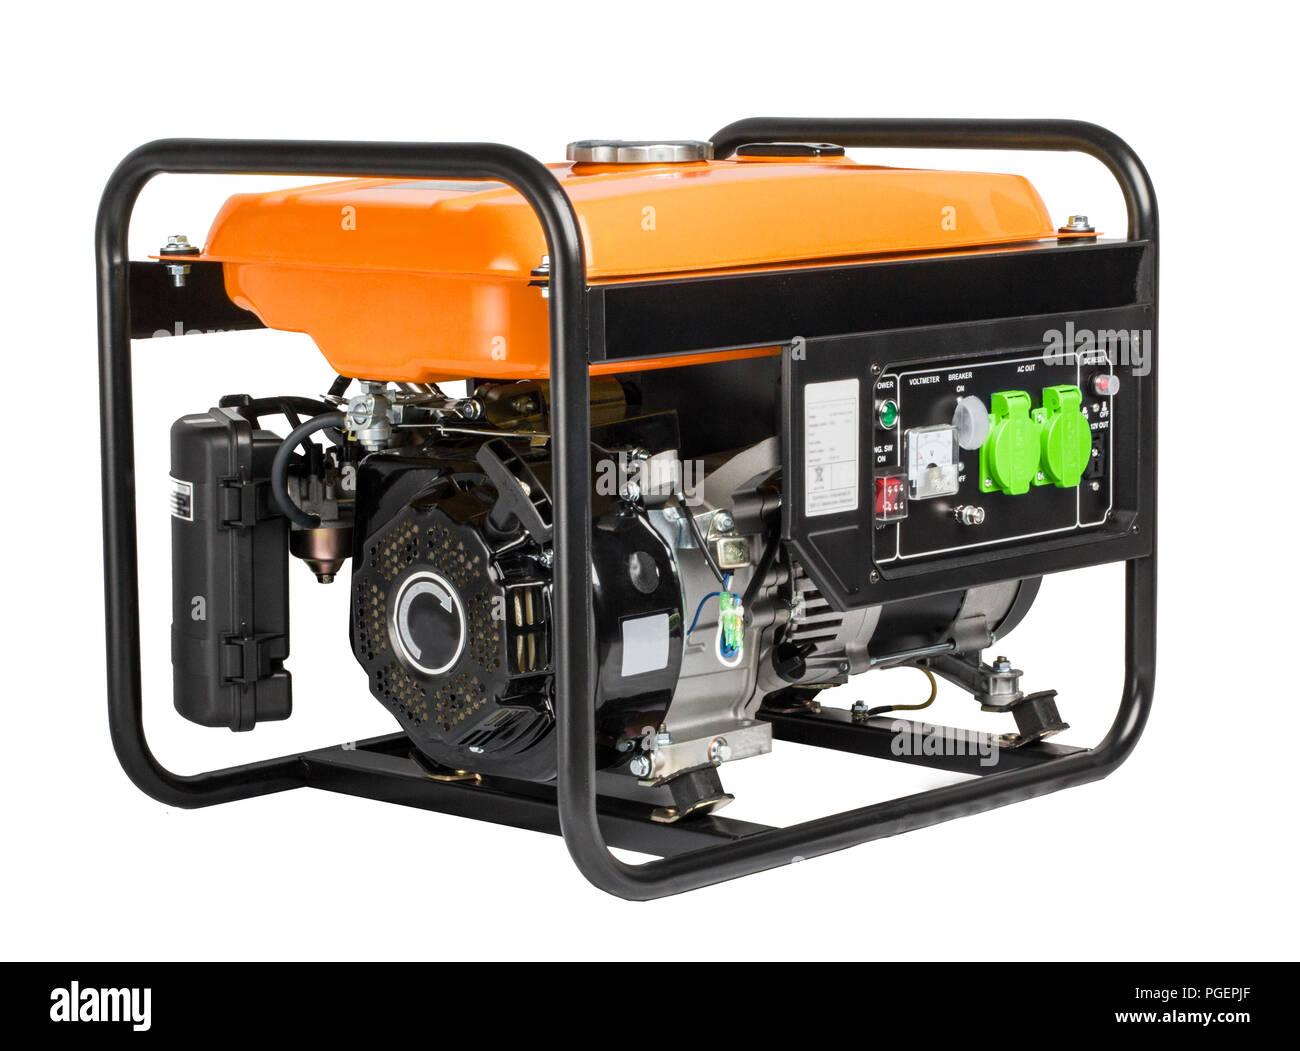 Electric AC Generator Alternator, isolated on white. Portable benzin generator. white background. Stock Photo